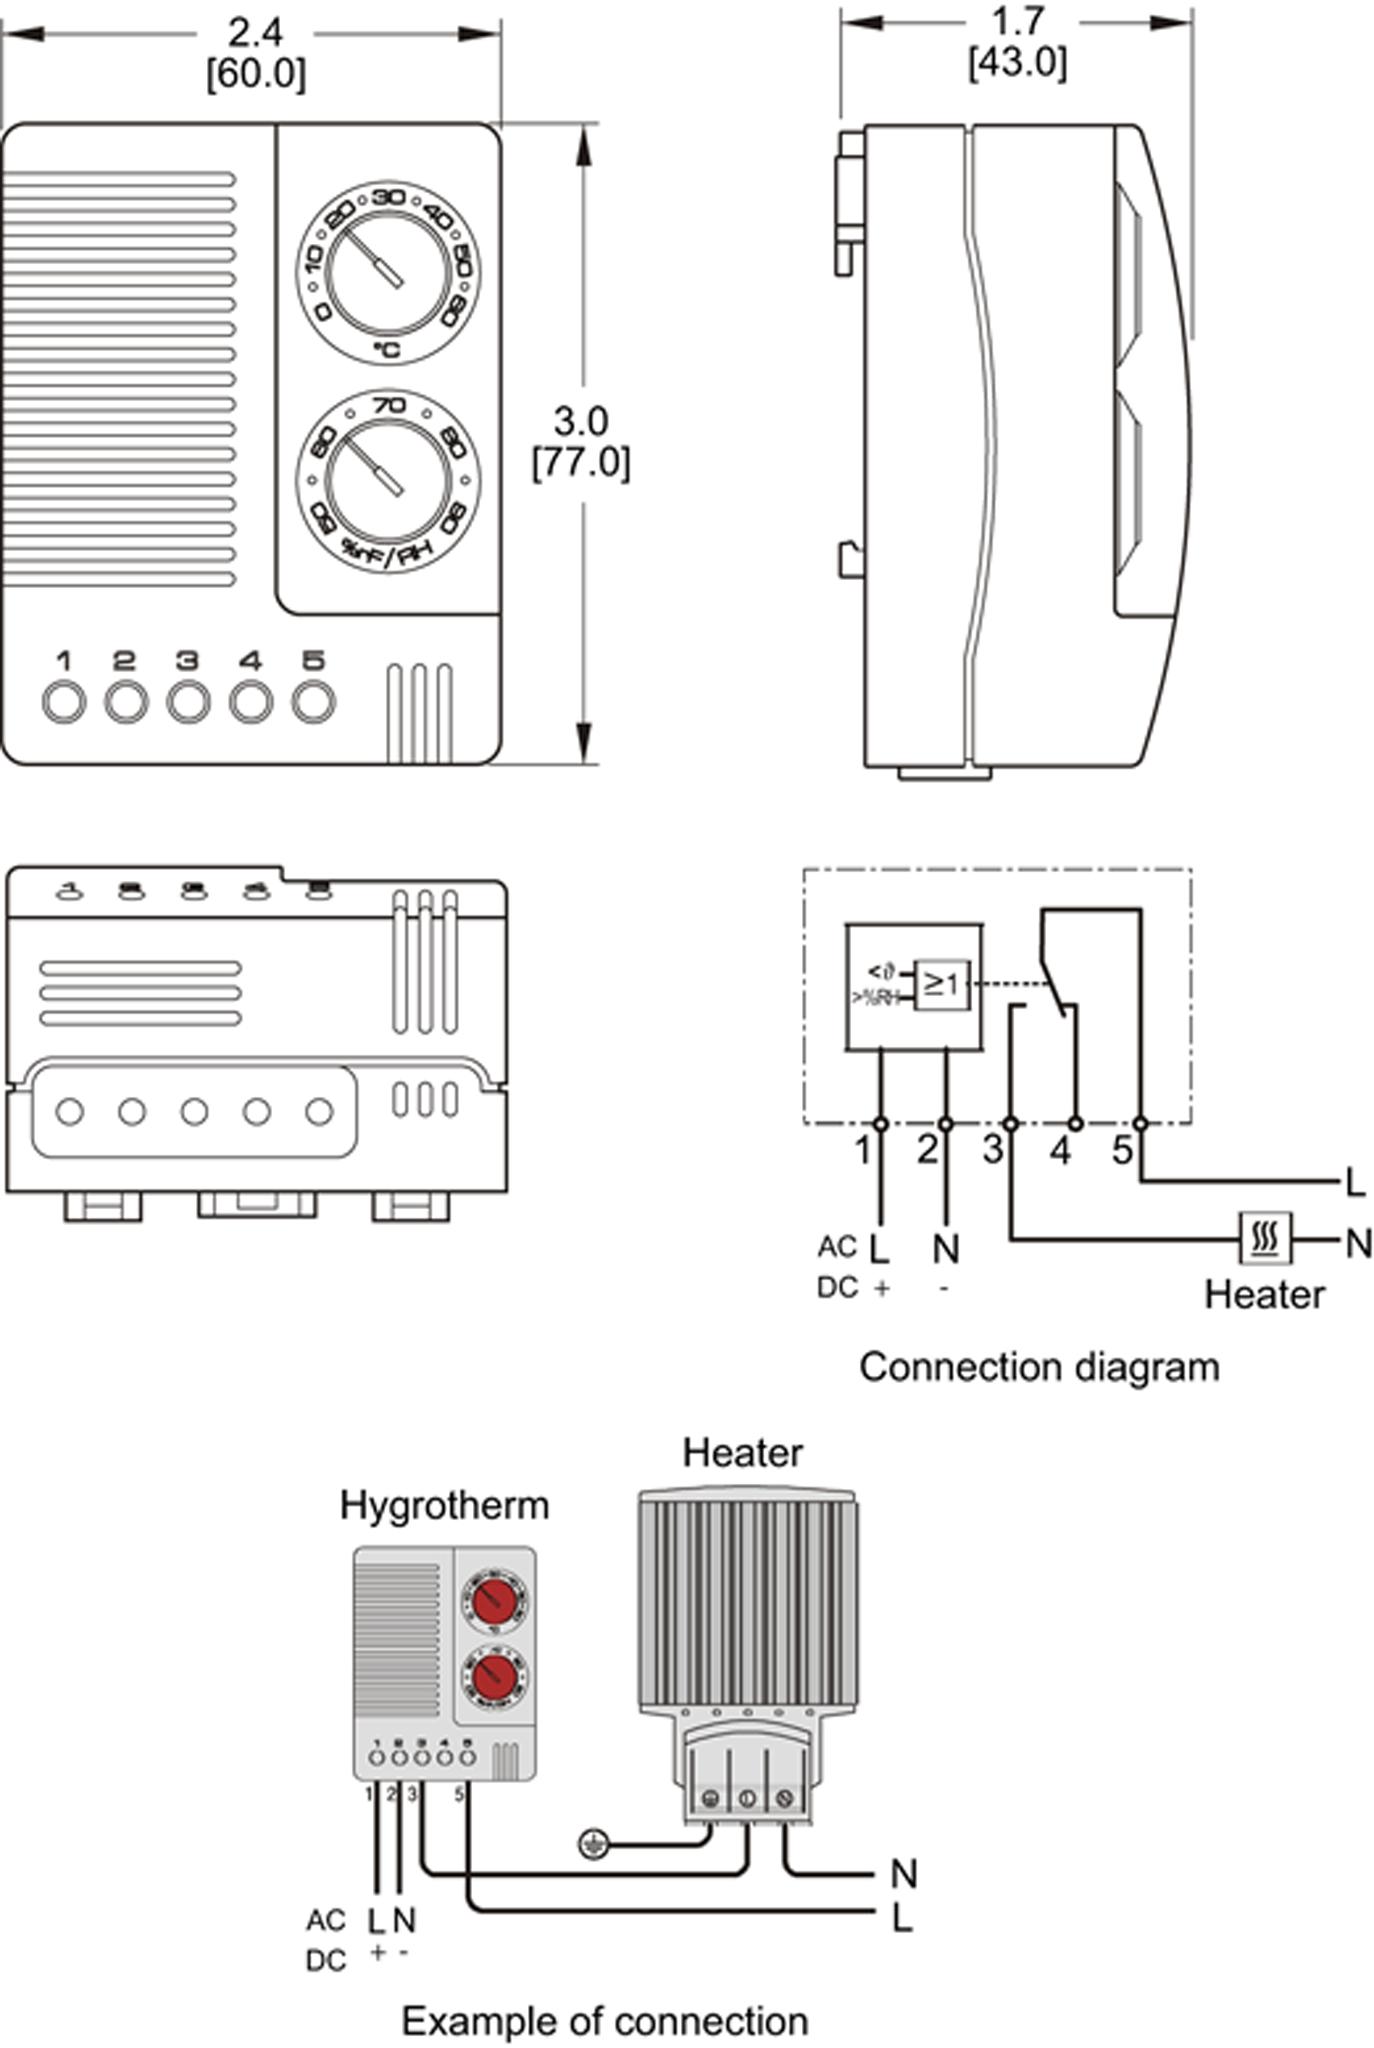 Hygrotherm General Arrangement Drawing